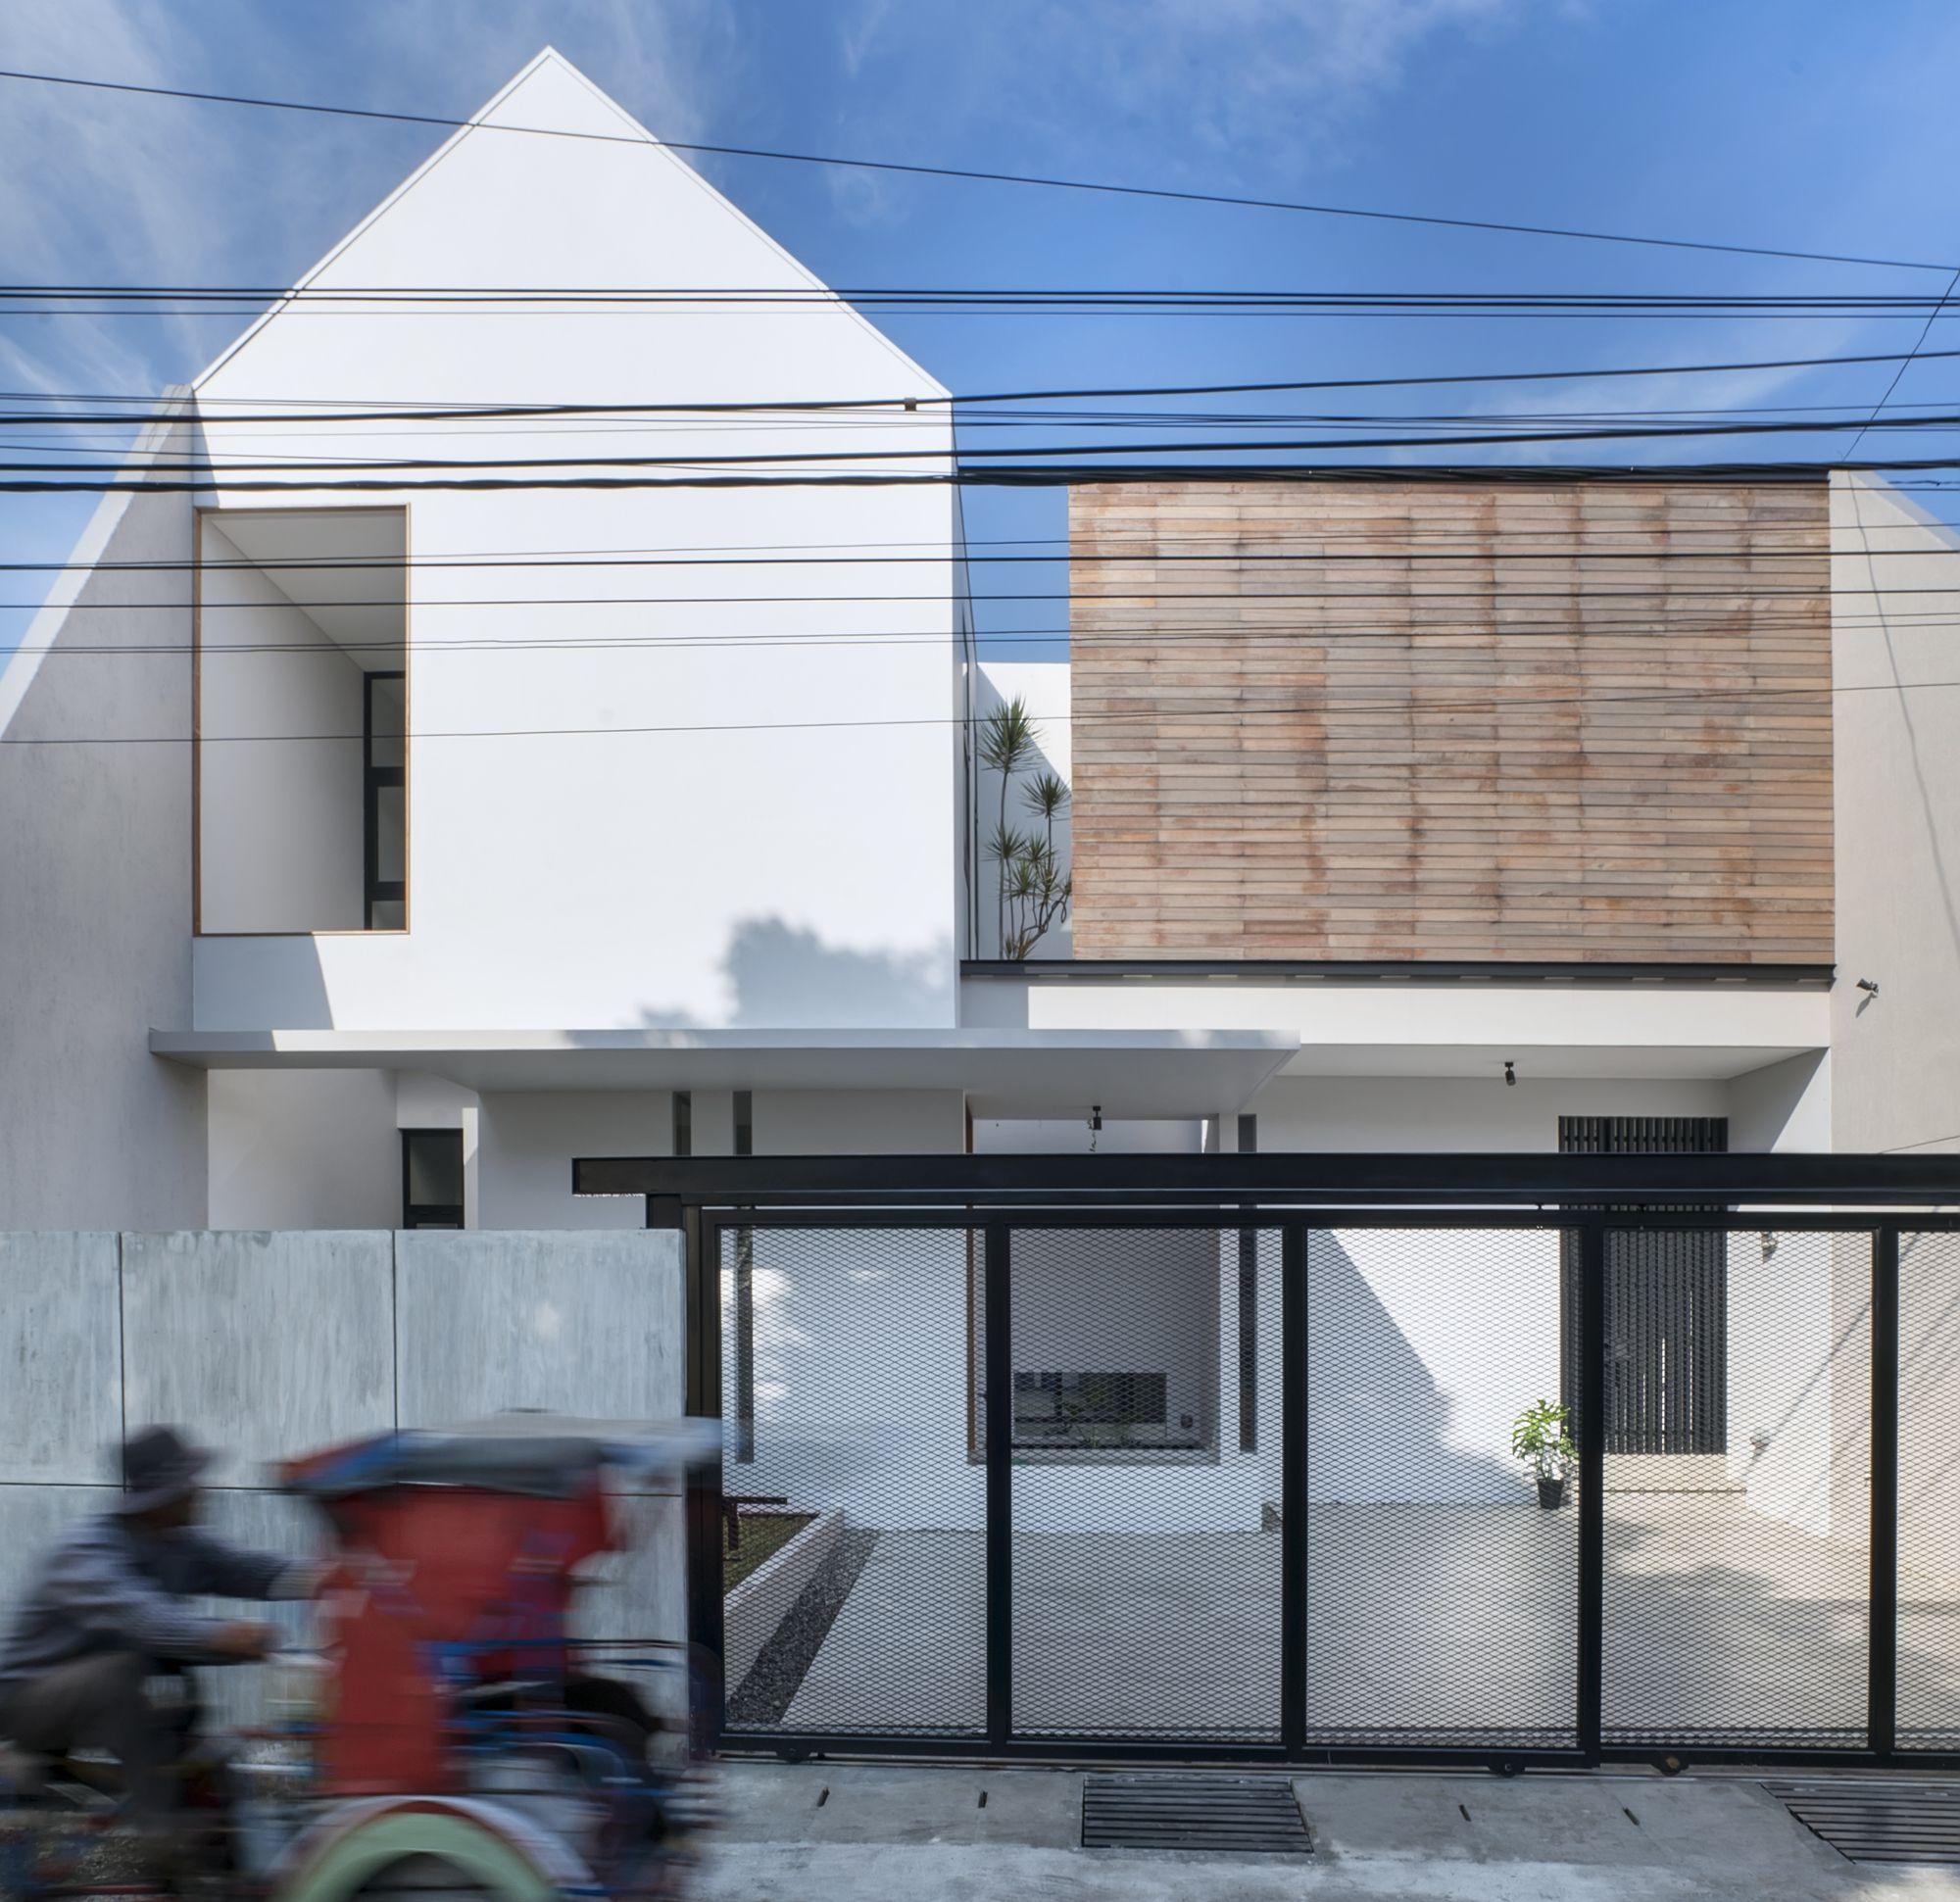 Casa At 3 56 E Re Studio Fachada De Casa Diseno Minimalista De Vivienda Arquitectura De La Casa